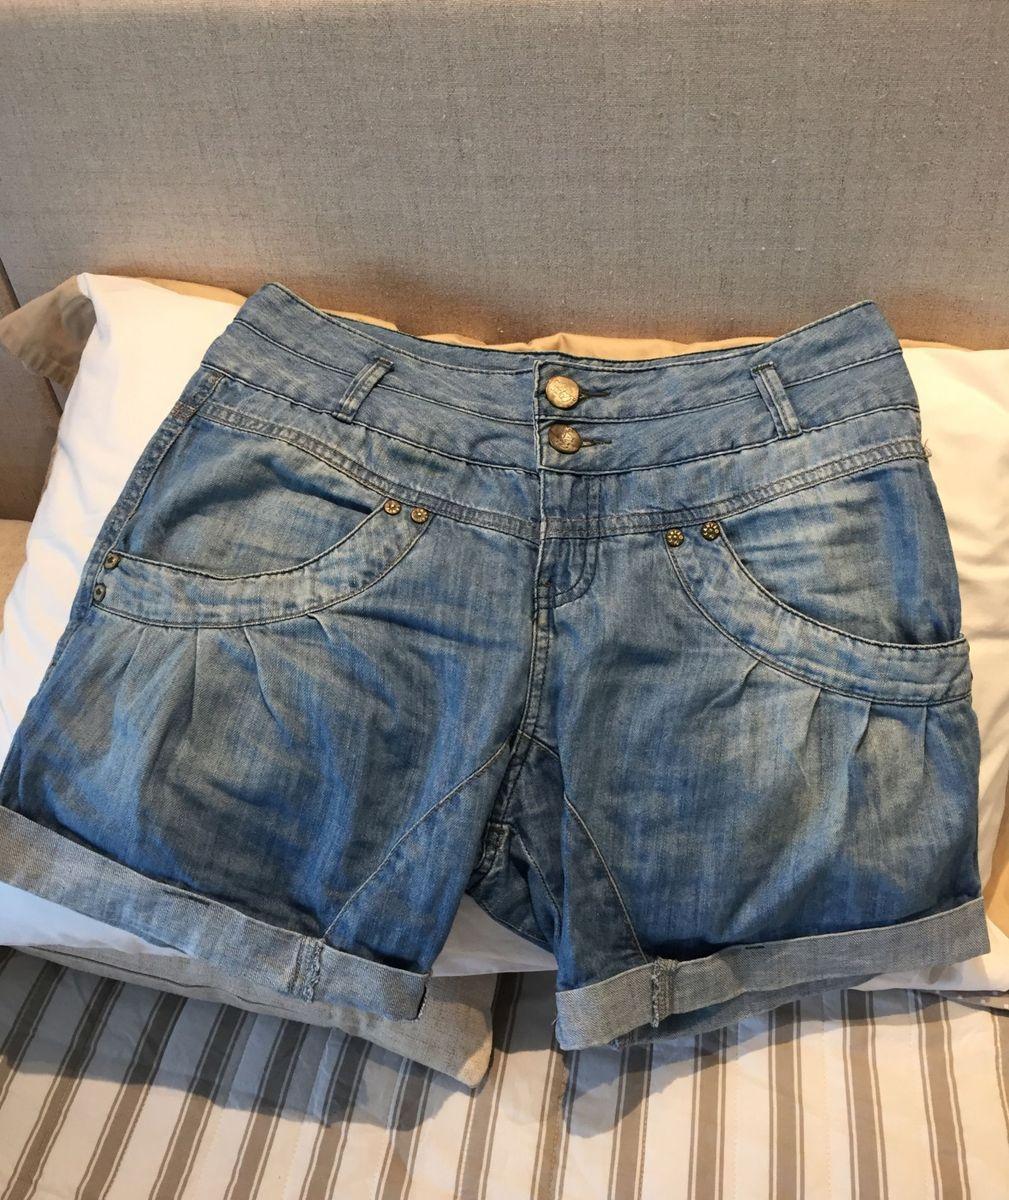 5c53d46a2 short jeans - short cantao.  Czm6ly9wag90b3muzw5qb2vplmnvbs5ici9wcm9kdwn0cy82nteymjuxlzu3mju5ytlhoge4mme1mda5mta4mgu5owy1zge1otqxlmpwzw